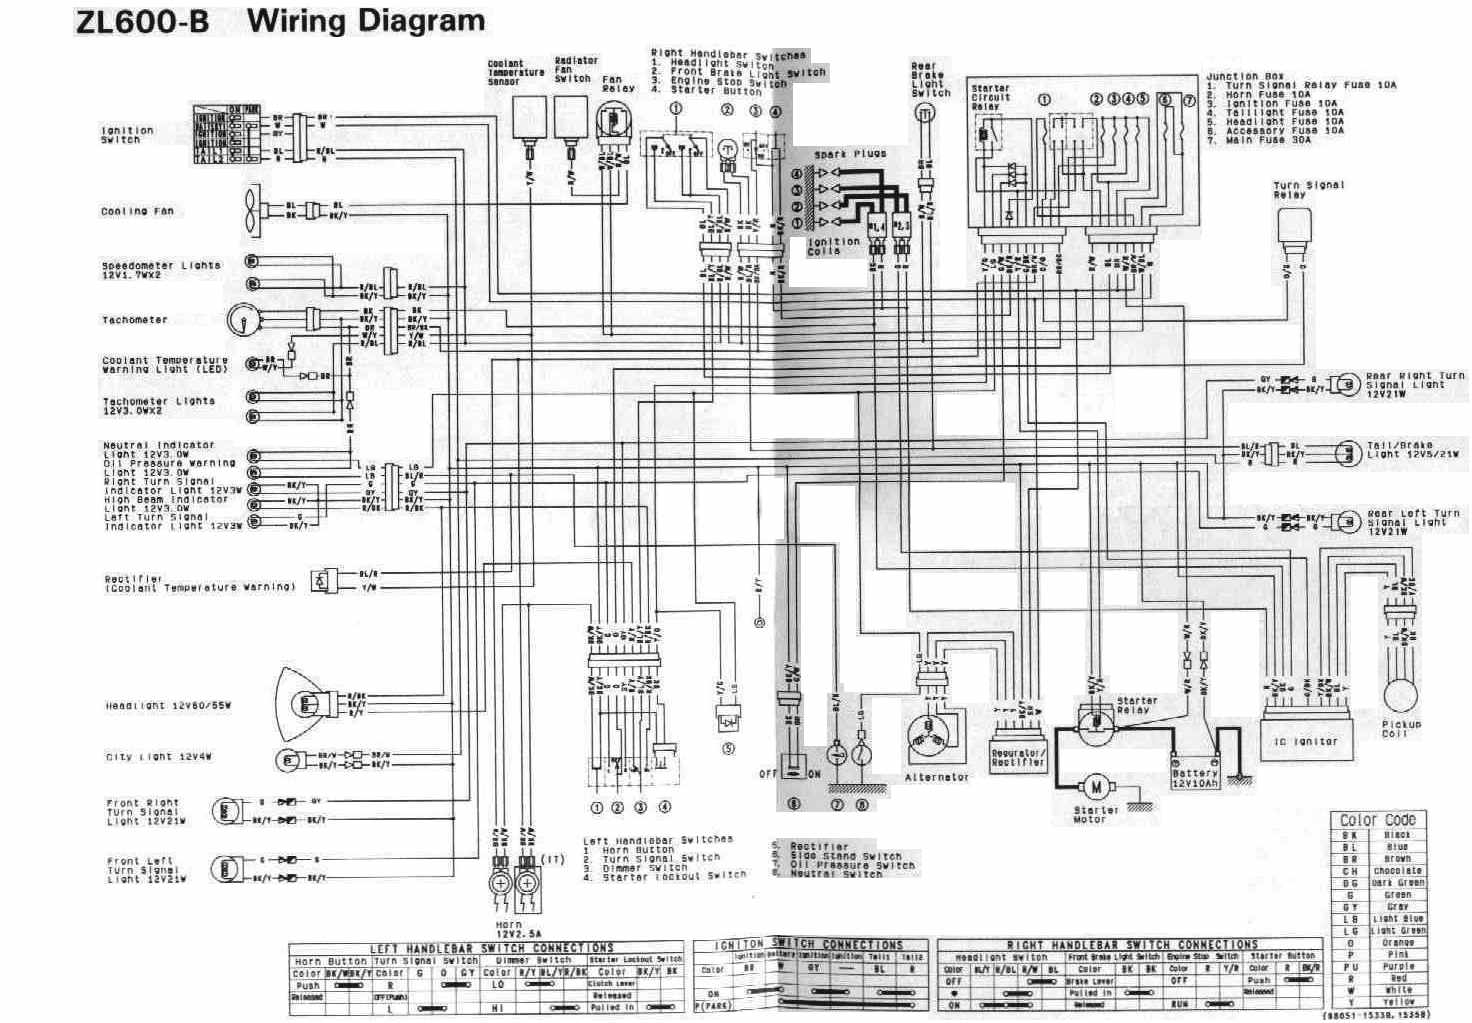 kawasaki concours 14 wiring diagram concours wiring diagram database rh ads lewisbusinessmedia co uk Automotive Wiring Diagrams wiring diagram x500 john deere mower